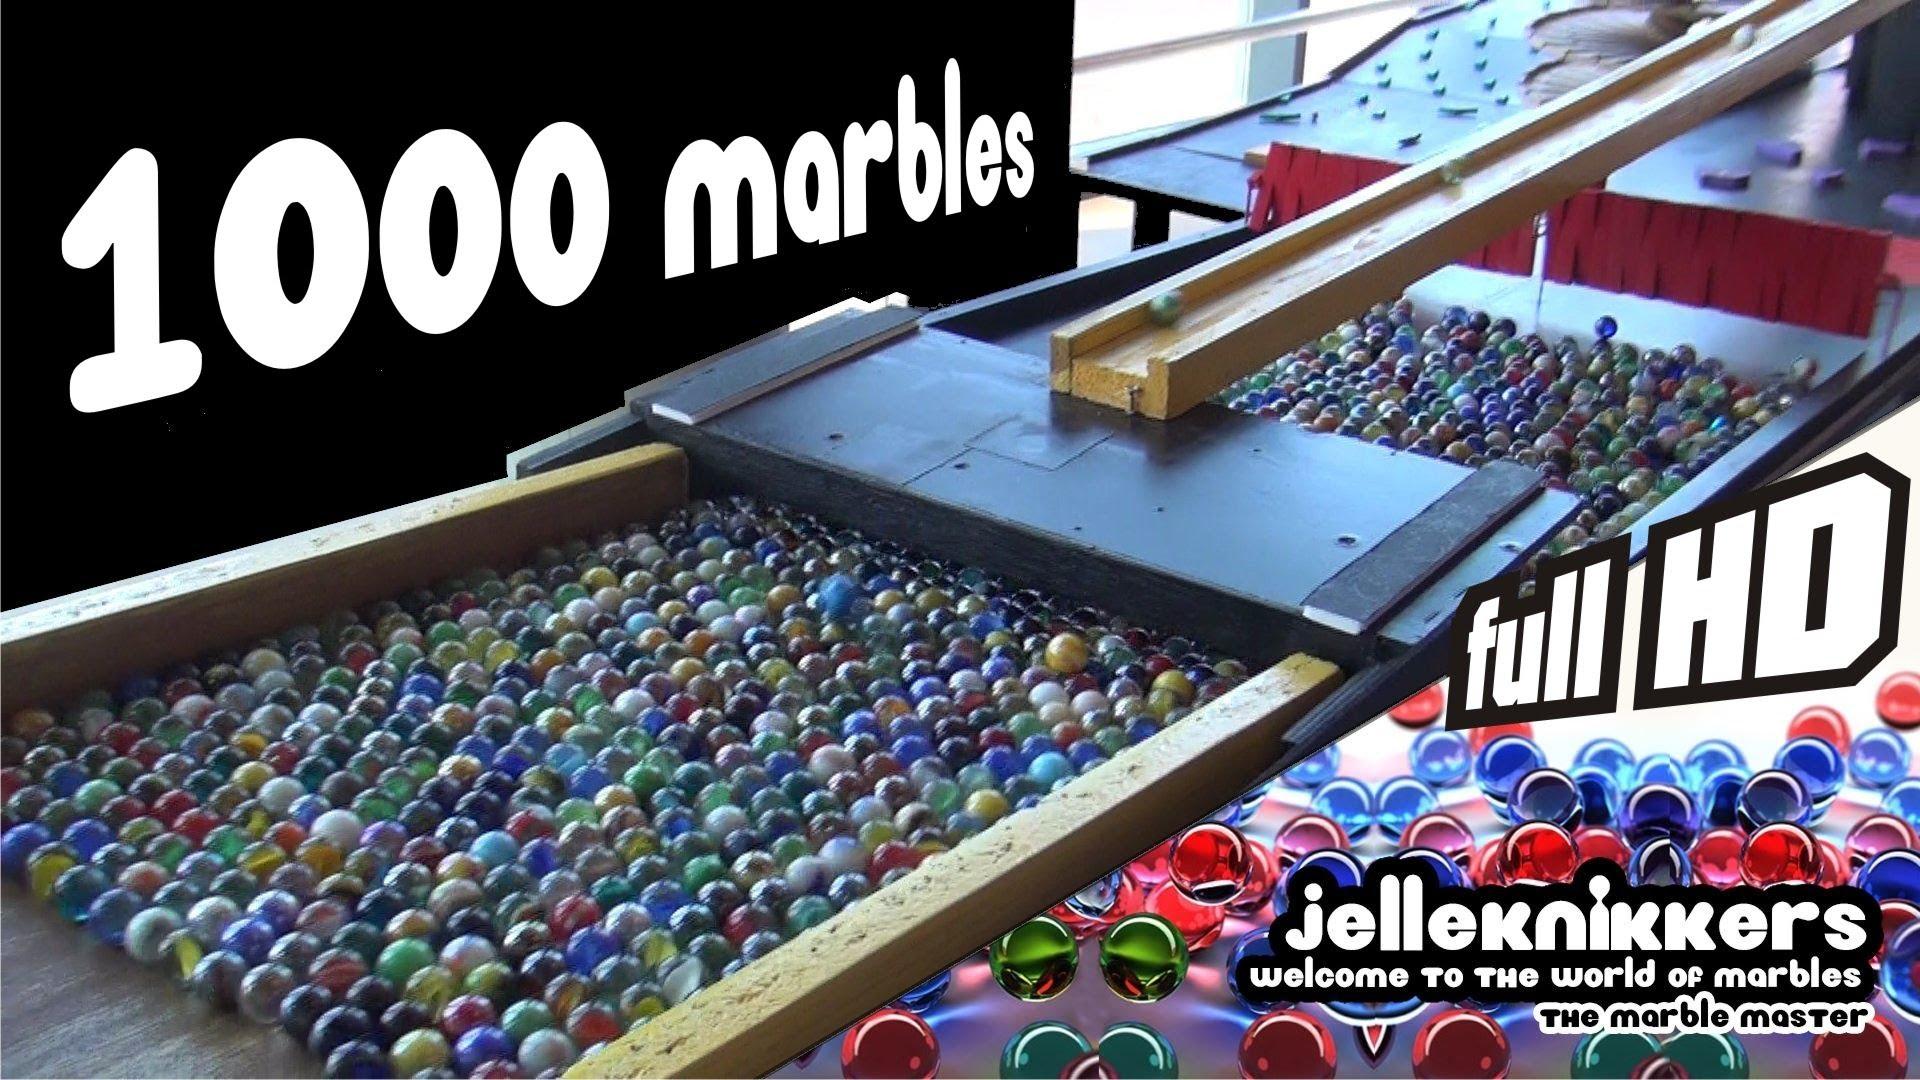 Big Marble Machine (1000 Marbles)